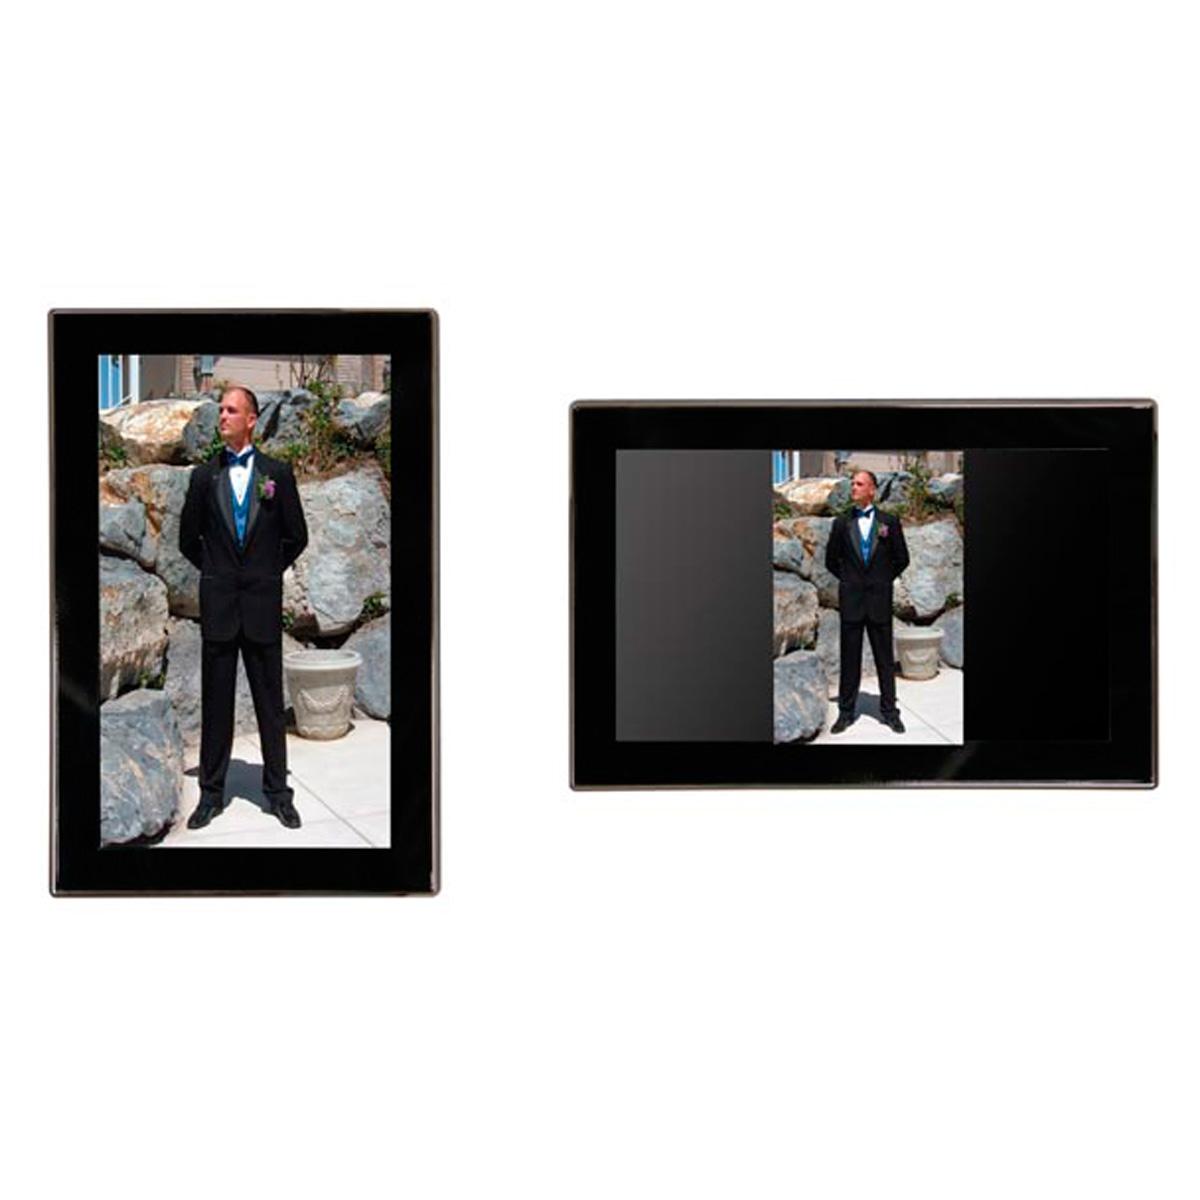 Marco de fotos digital 7\